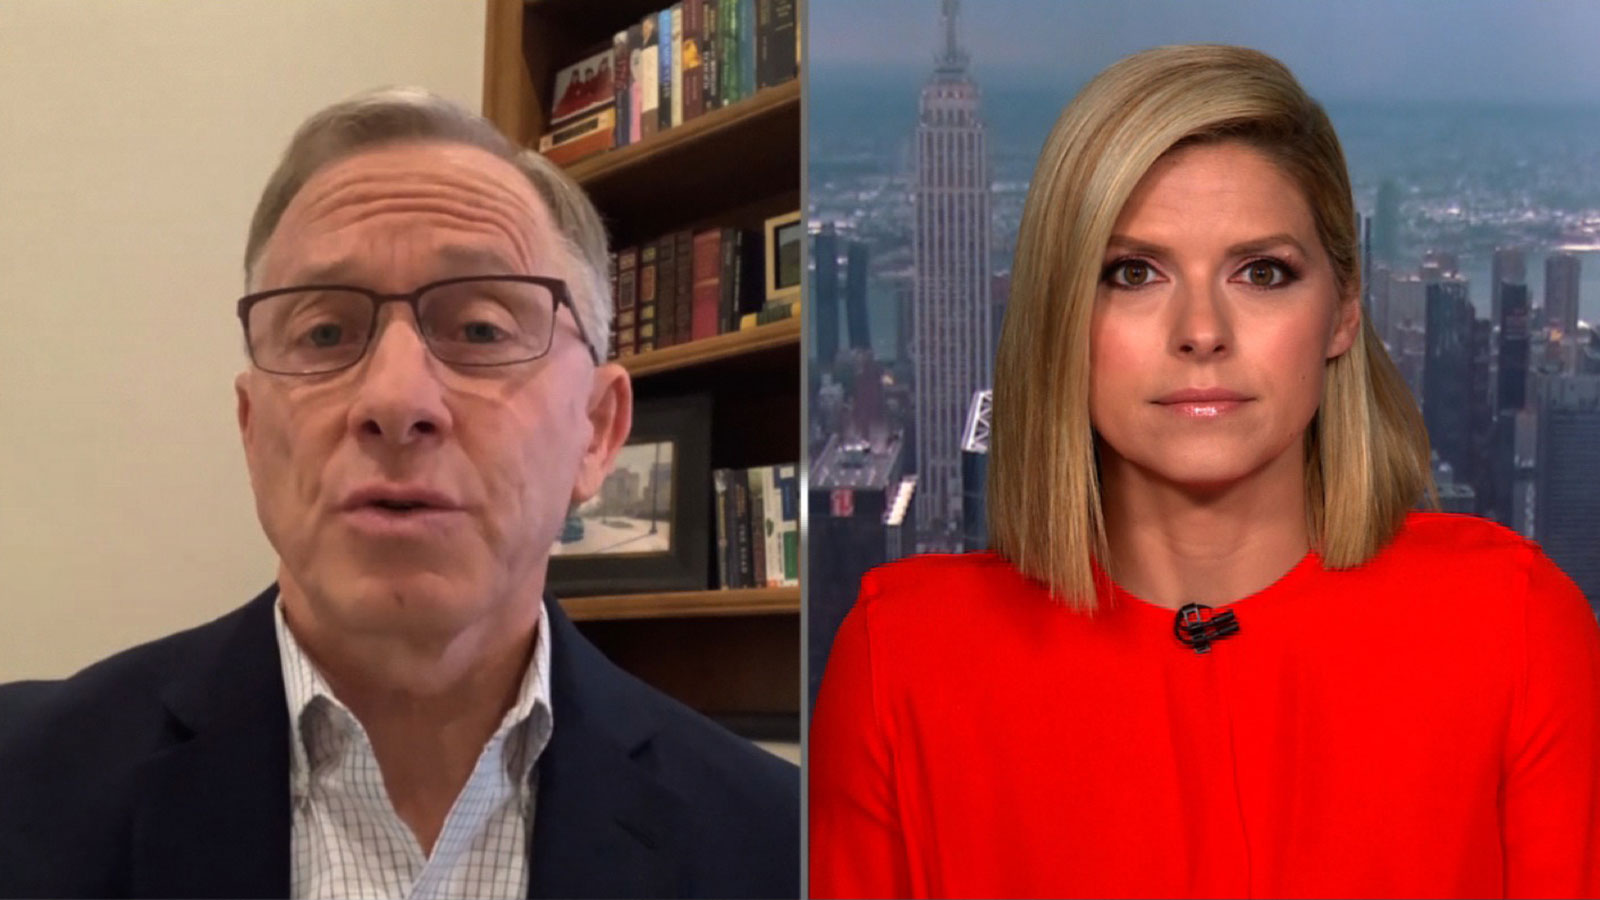 Mesa, Arizona Mayor John Giles speaks with CNN's Kate Bolduan on July 1.